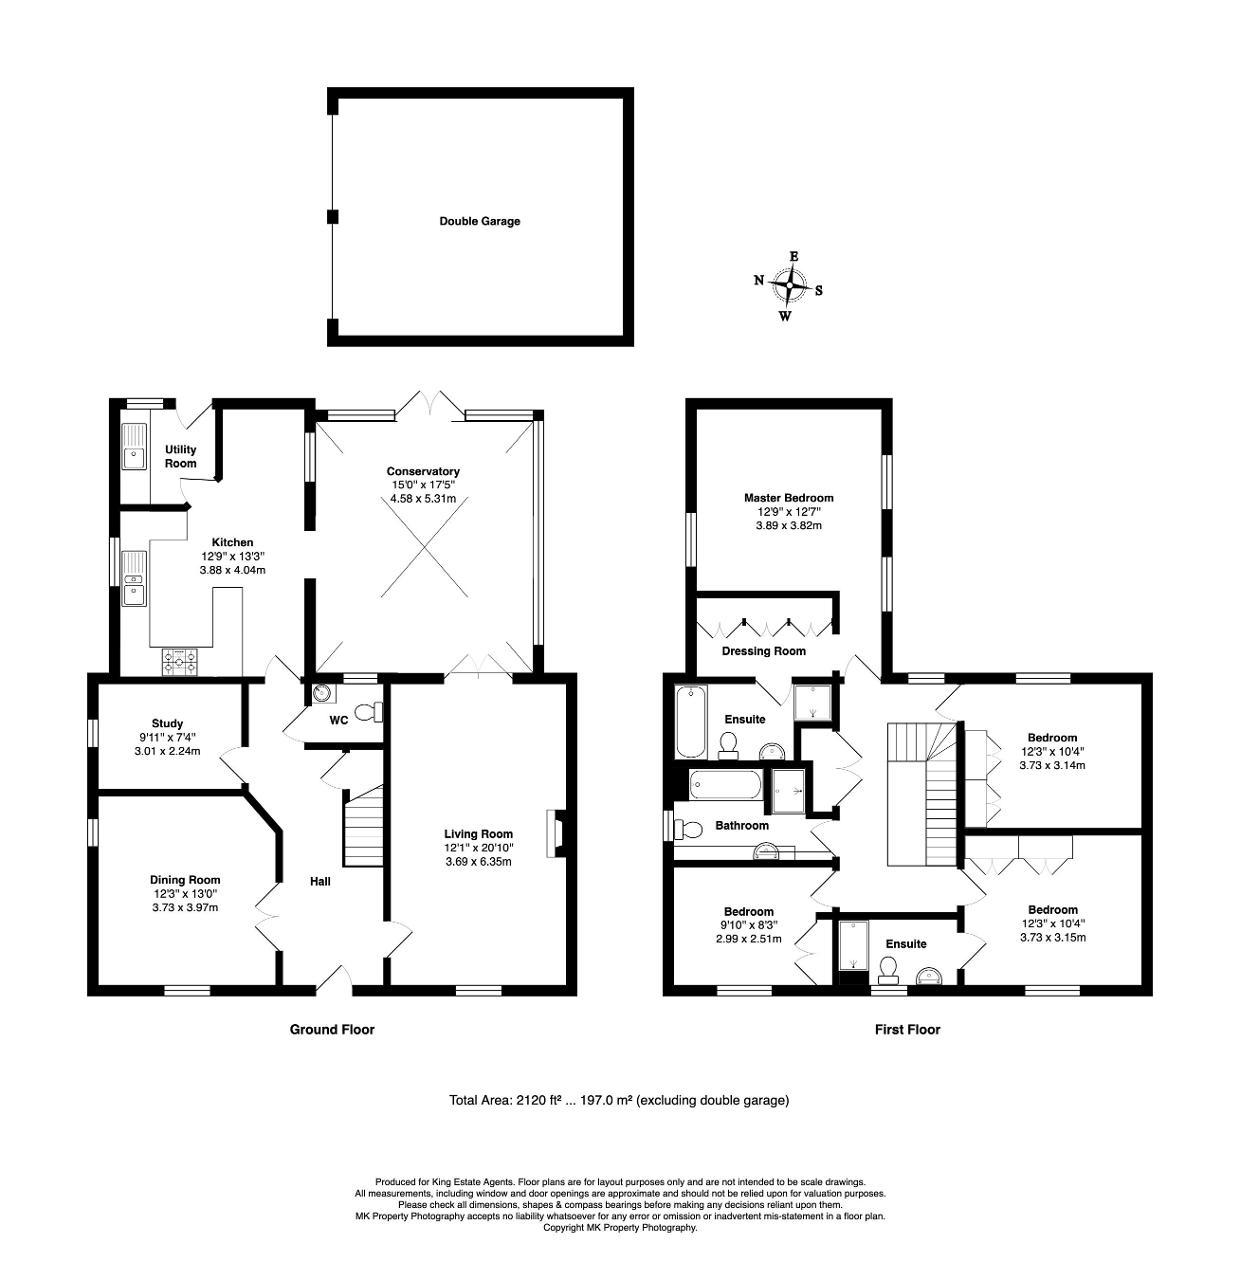 Floorplan for Blyth Court, Tattenhoe, Milton Keynes, Buckinghamshire, MK4 3EE